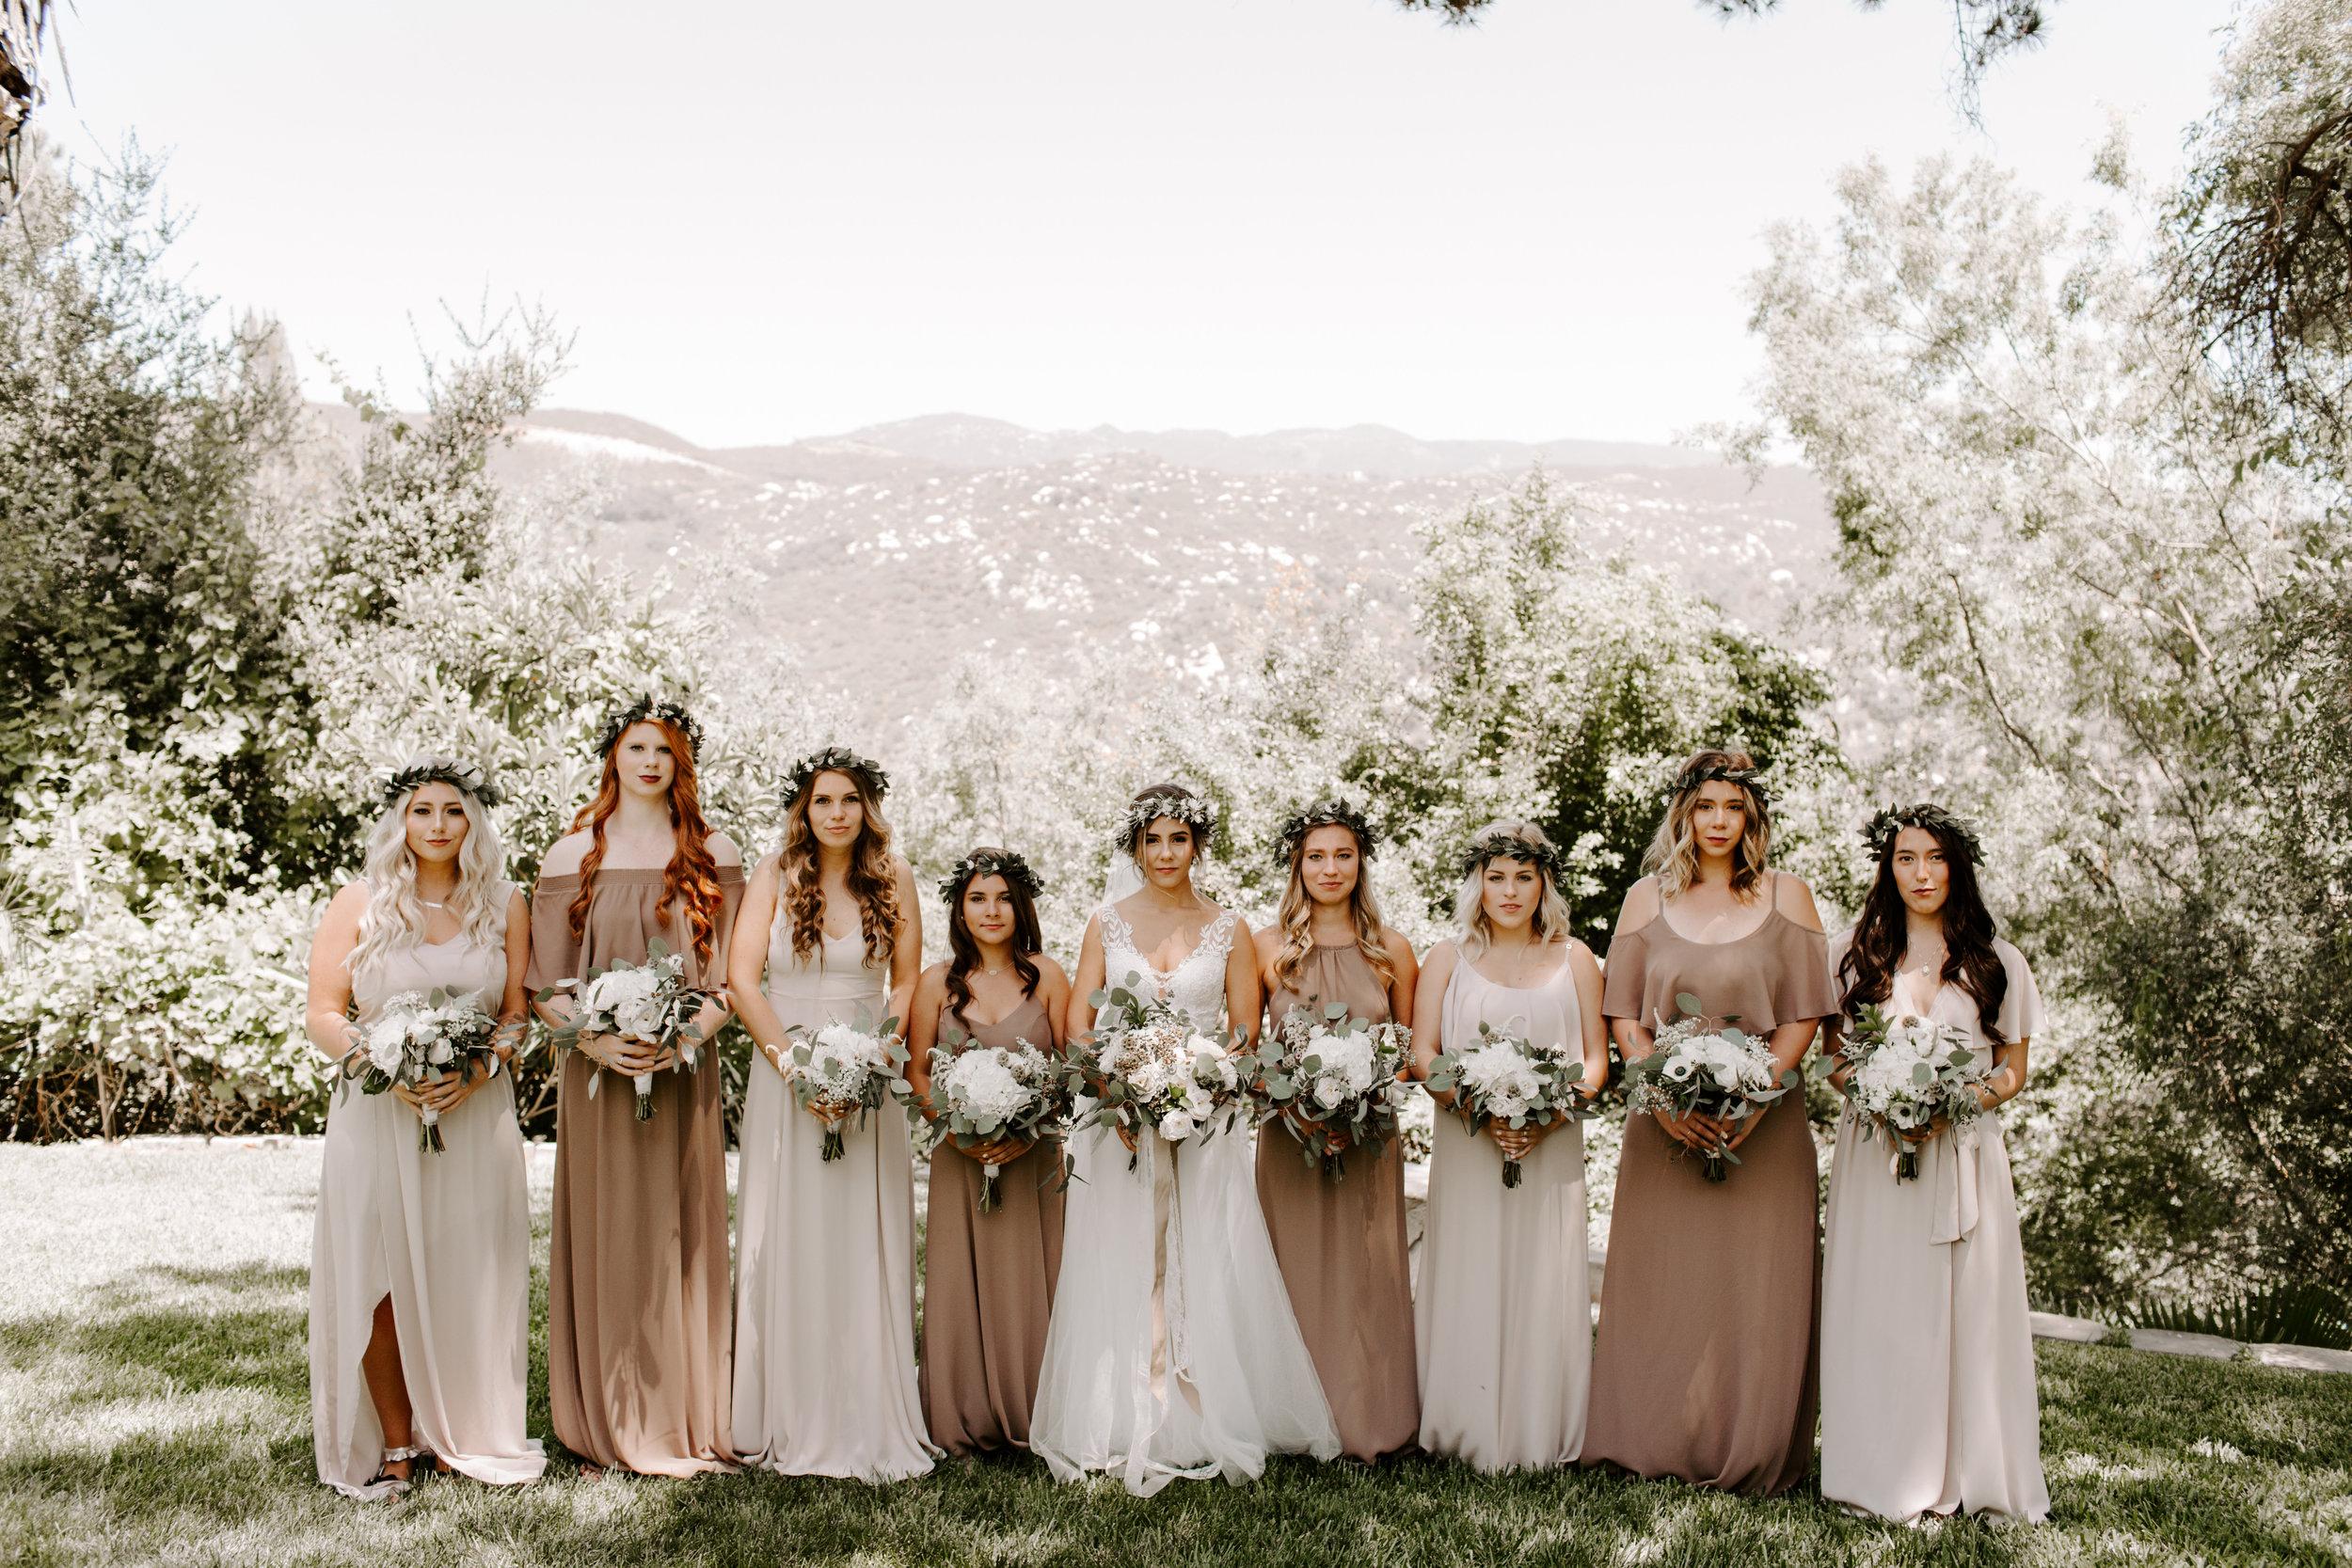 kate+zack_wedding_secludedgardenestate_temecula_madisonrylee_0417.jpg